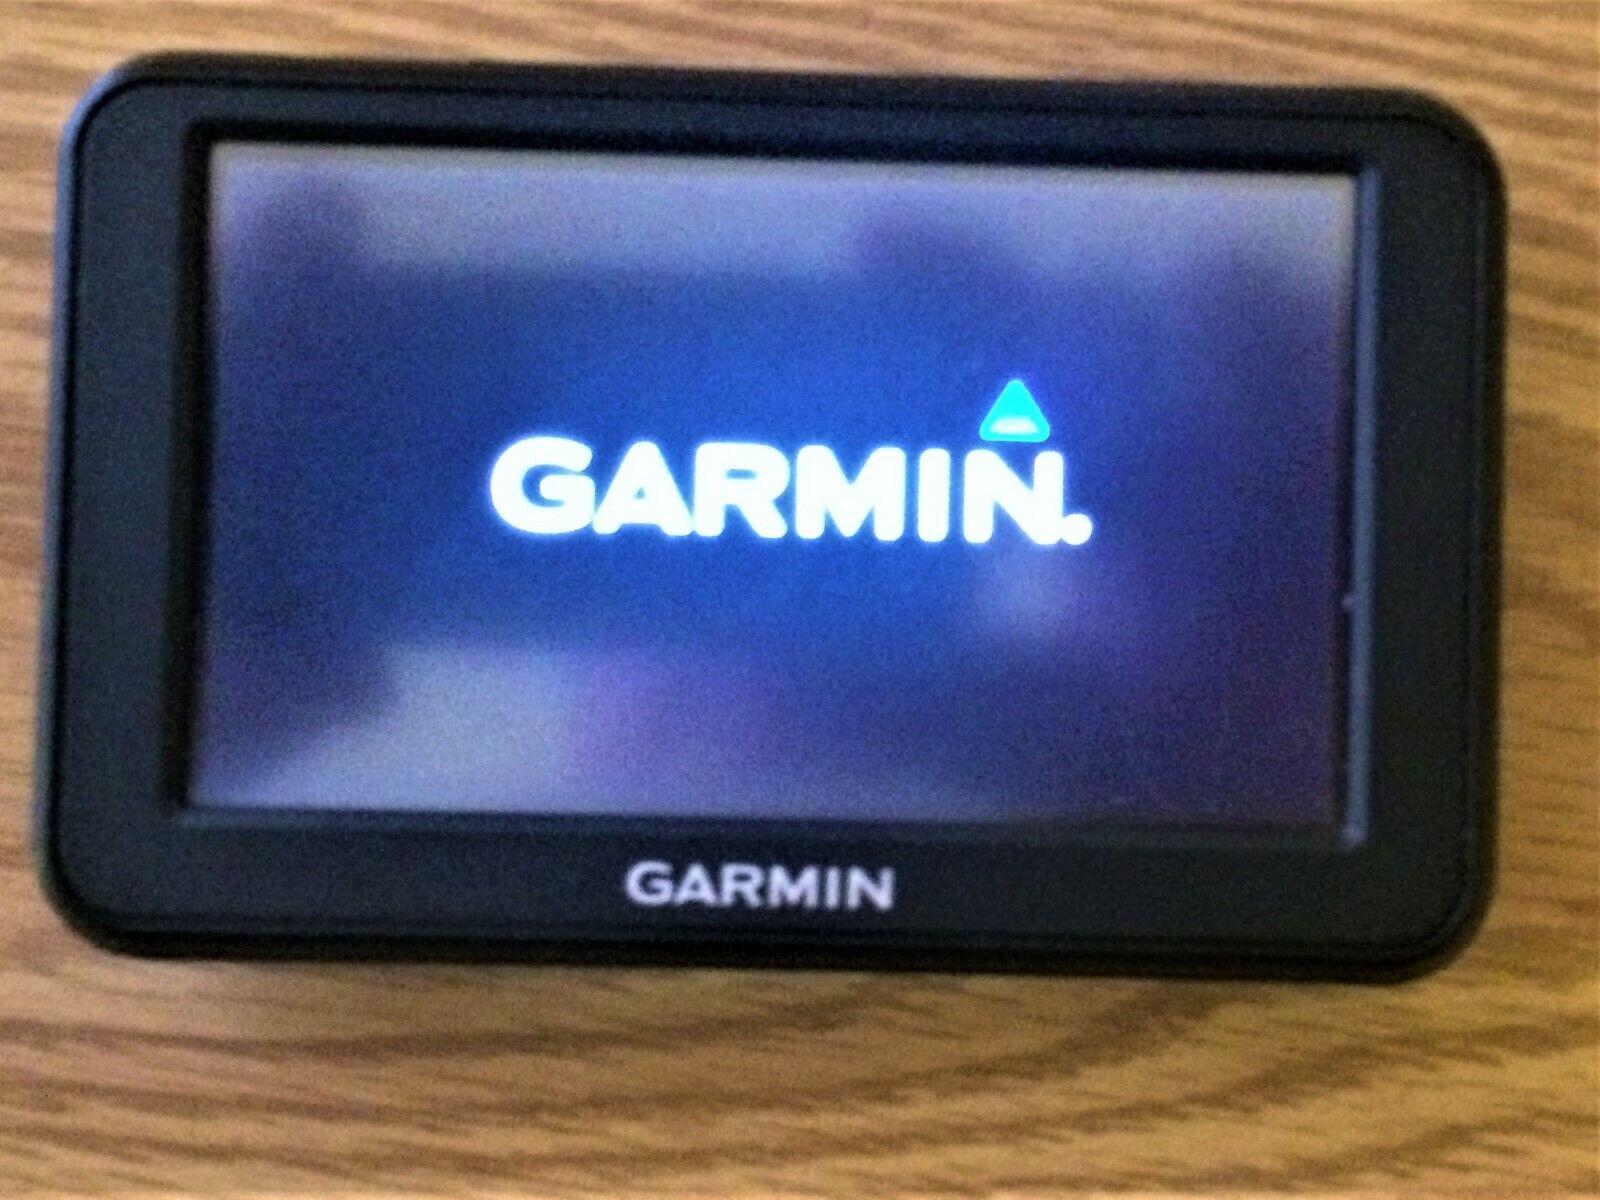 Garmin Nuvi 40LM 4.3-inch GPS Current Software 4.0 Bundle USB + AC + Car Adapter